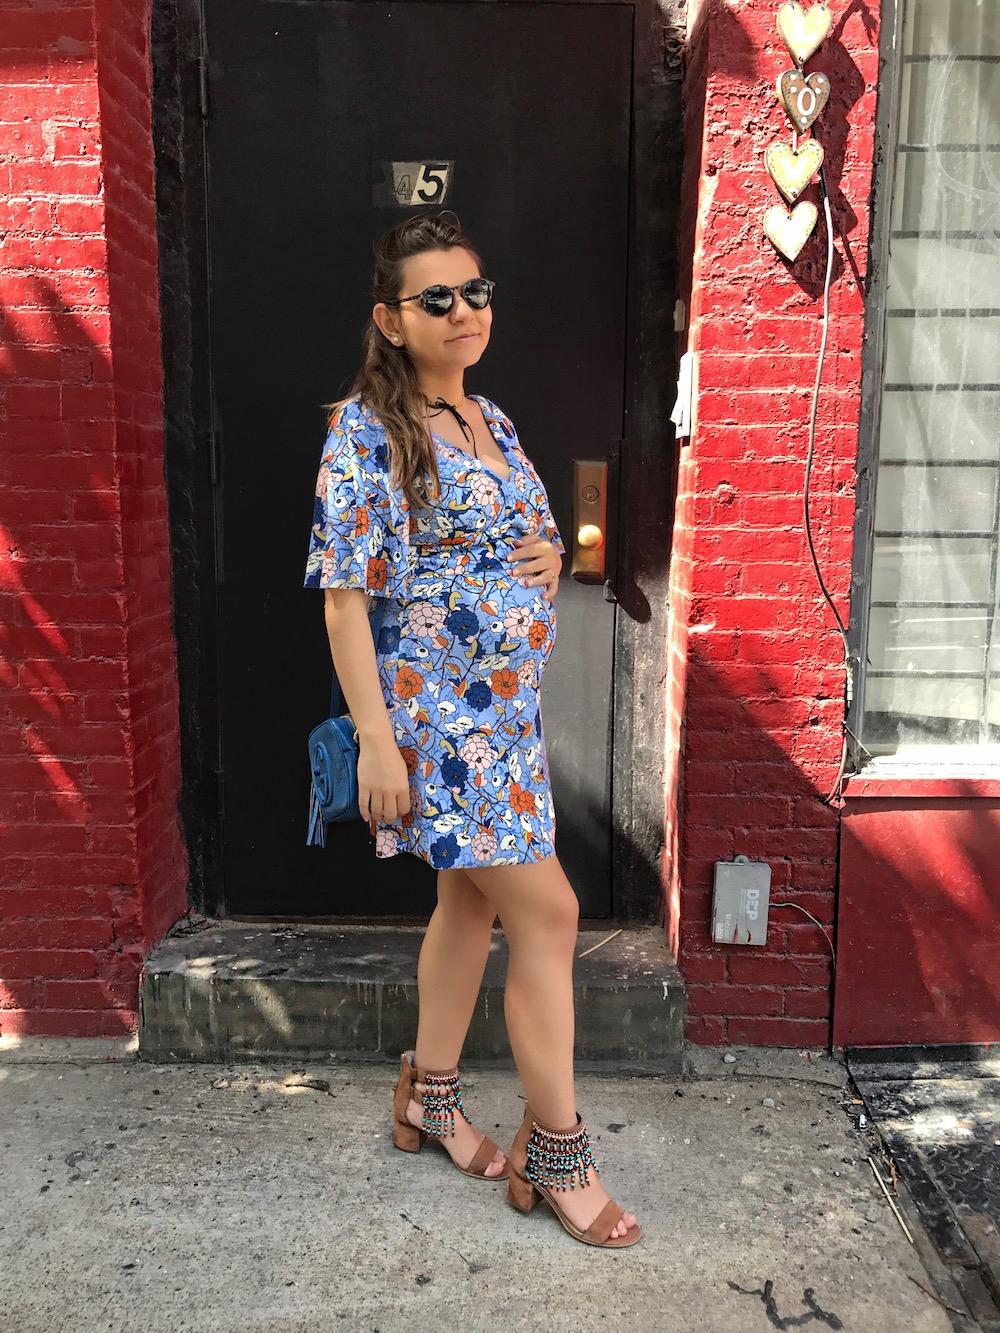 pregnancy-style-for-summer-floral-dress-zara-maternity-alley-girl-new-york-fashion-blog-3